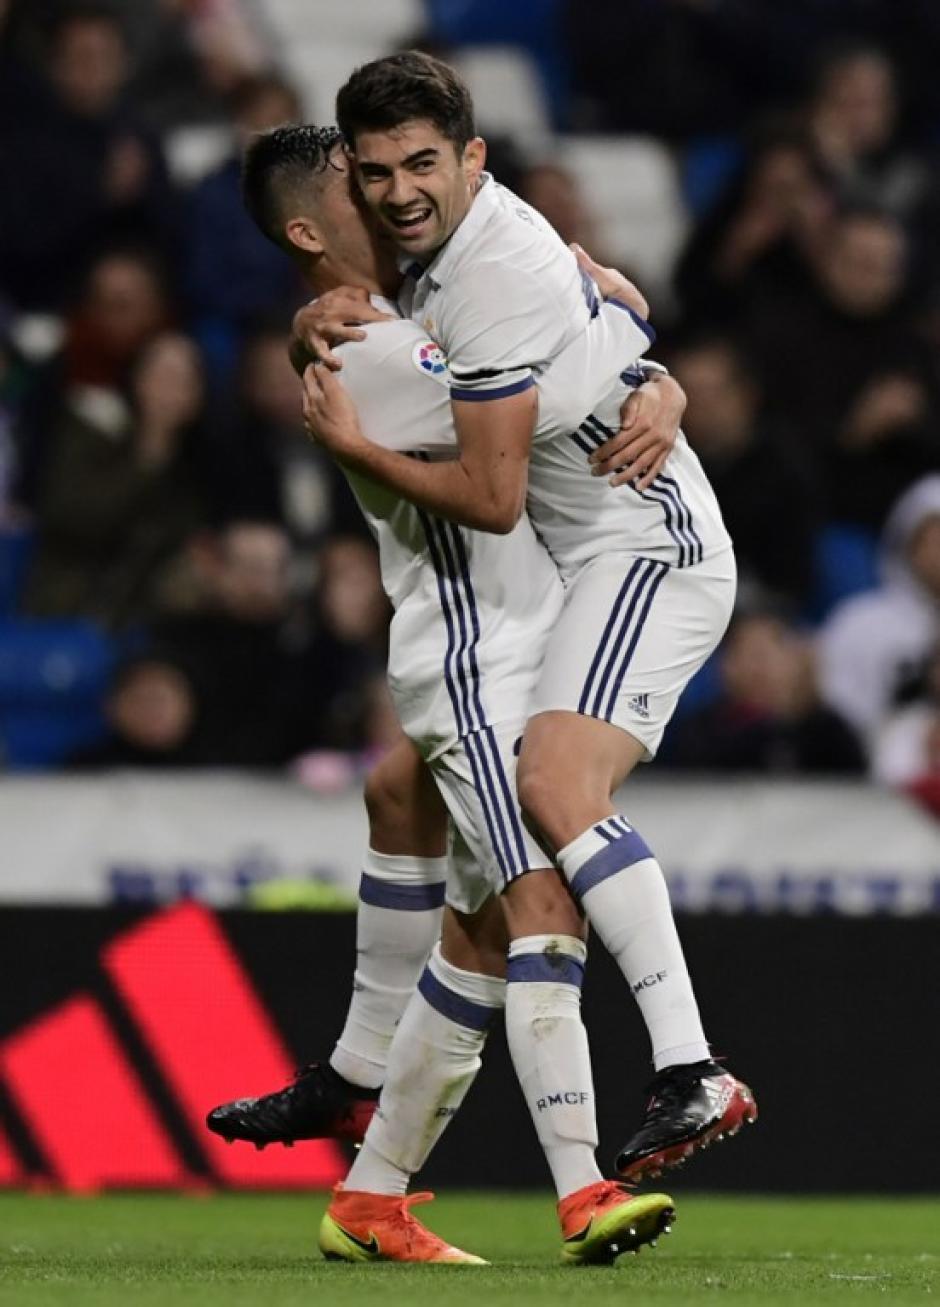 Enzo Zidane debutó con gol. (Foto: AFP)